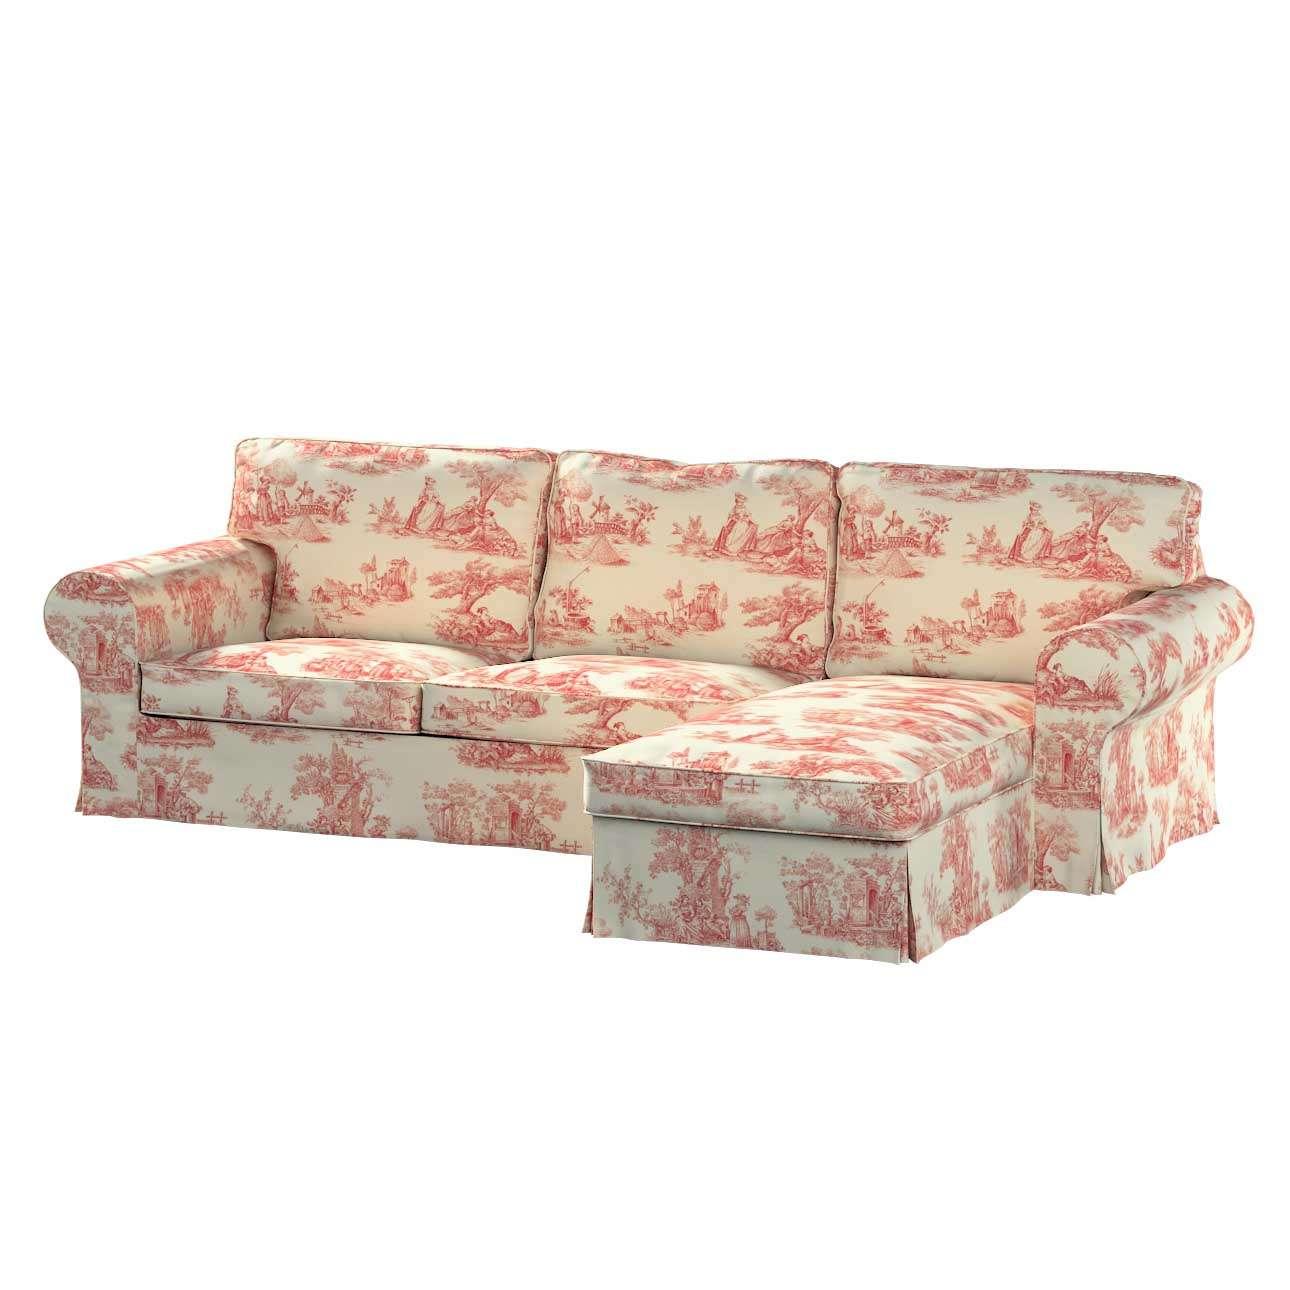 Potah na pohovku IKEA Ektorp 2-místná se šezlongem sofa ektorp 2-0s. i leżanka v kolekci Avignon, látka: 132-15